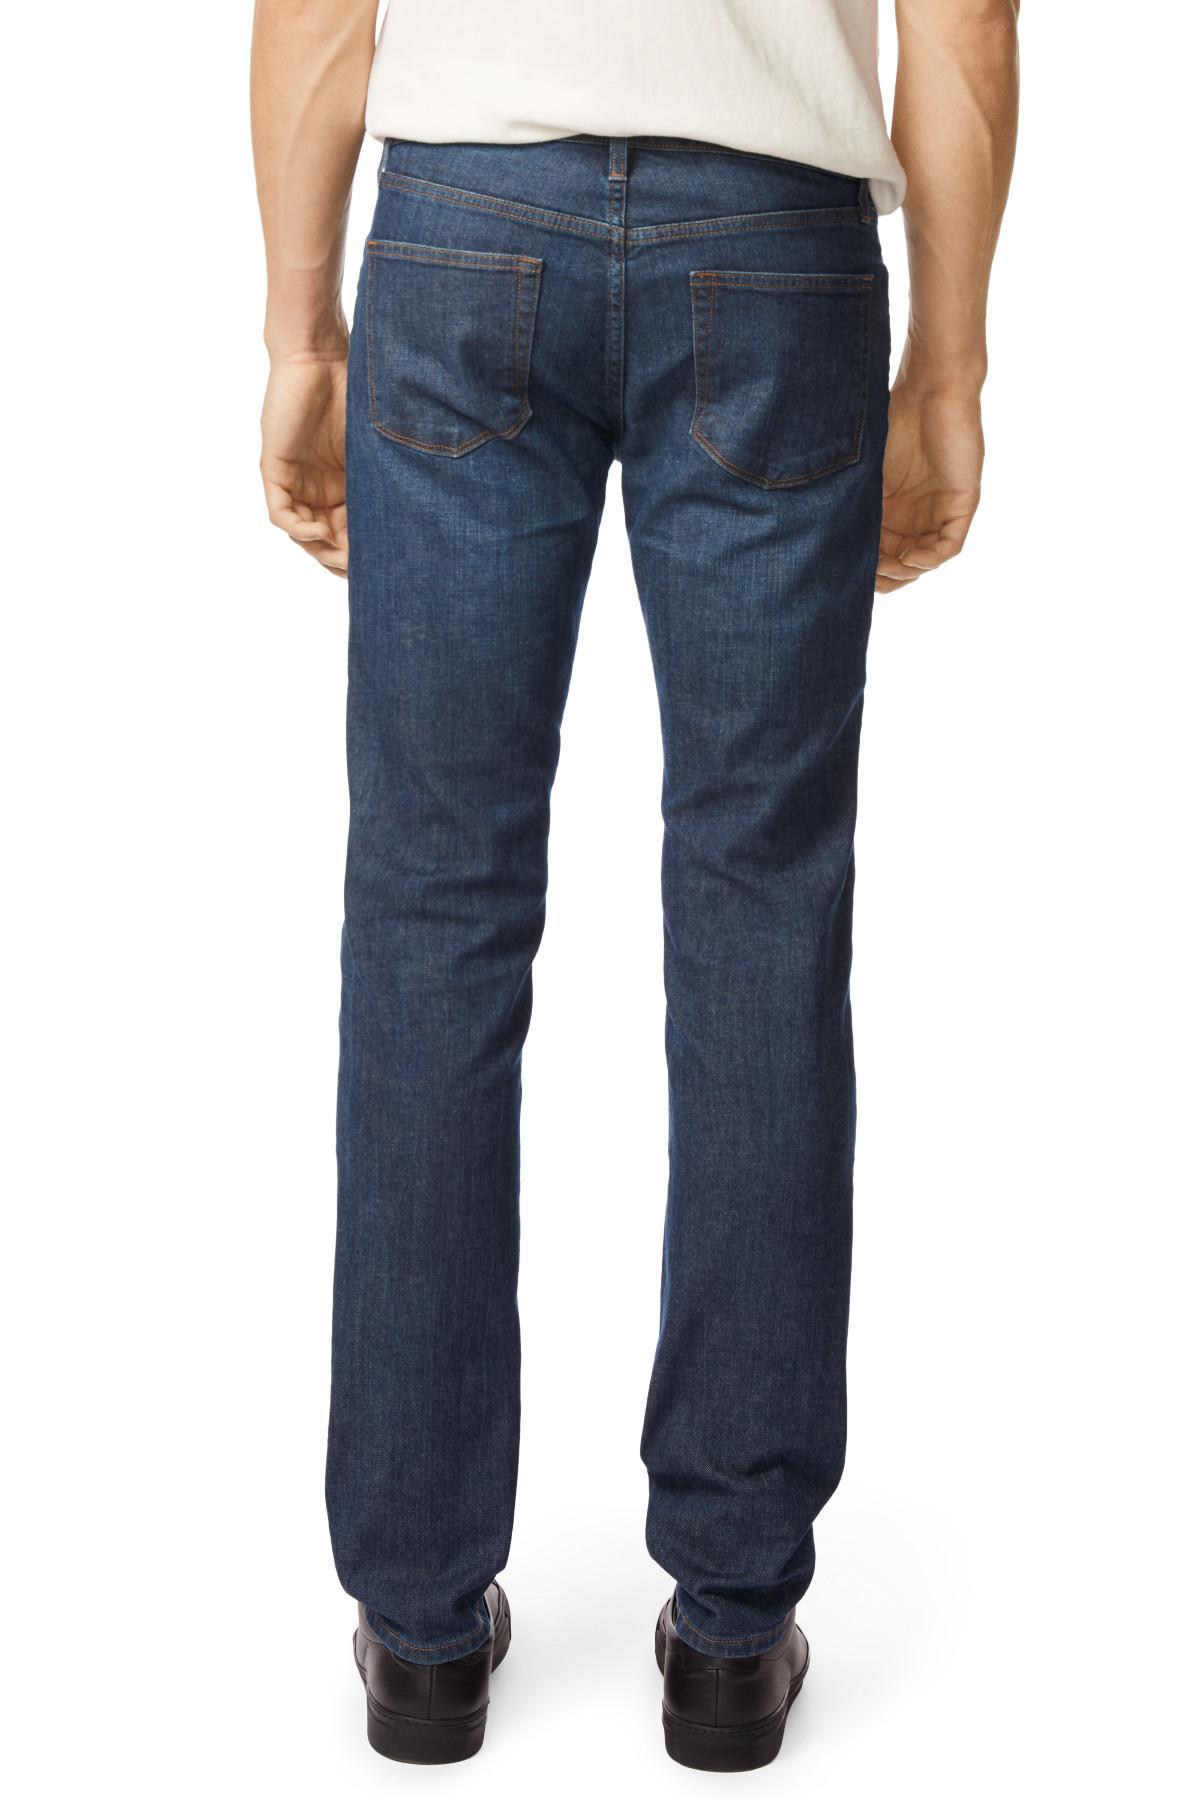 J Brand Cotton Kane Straight Fit In Venator in Blue for Men